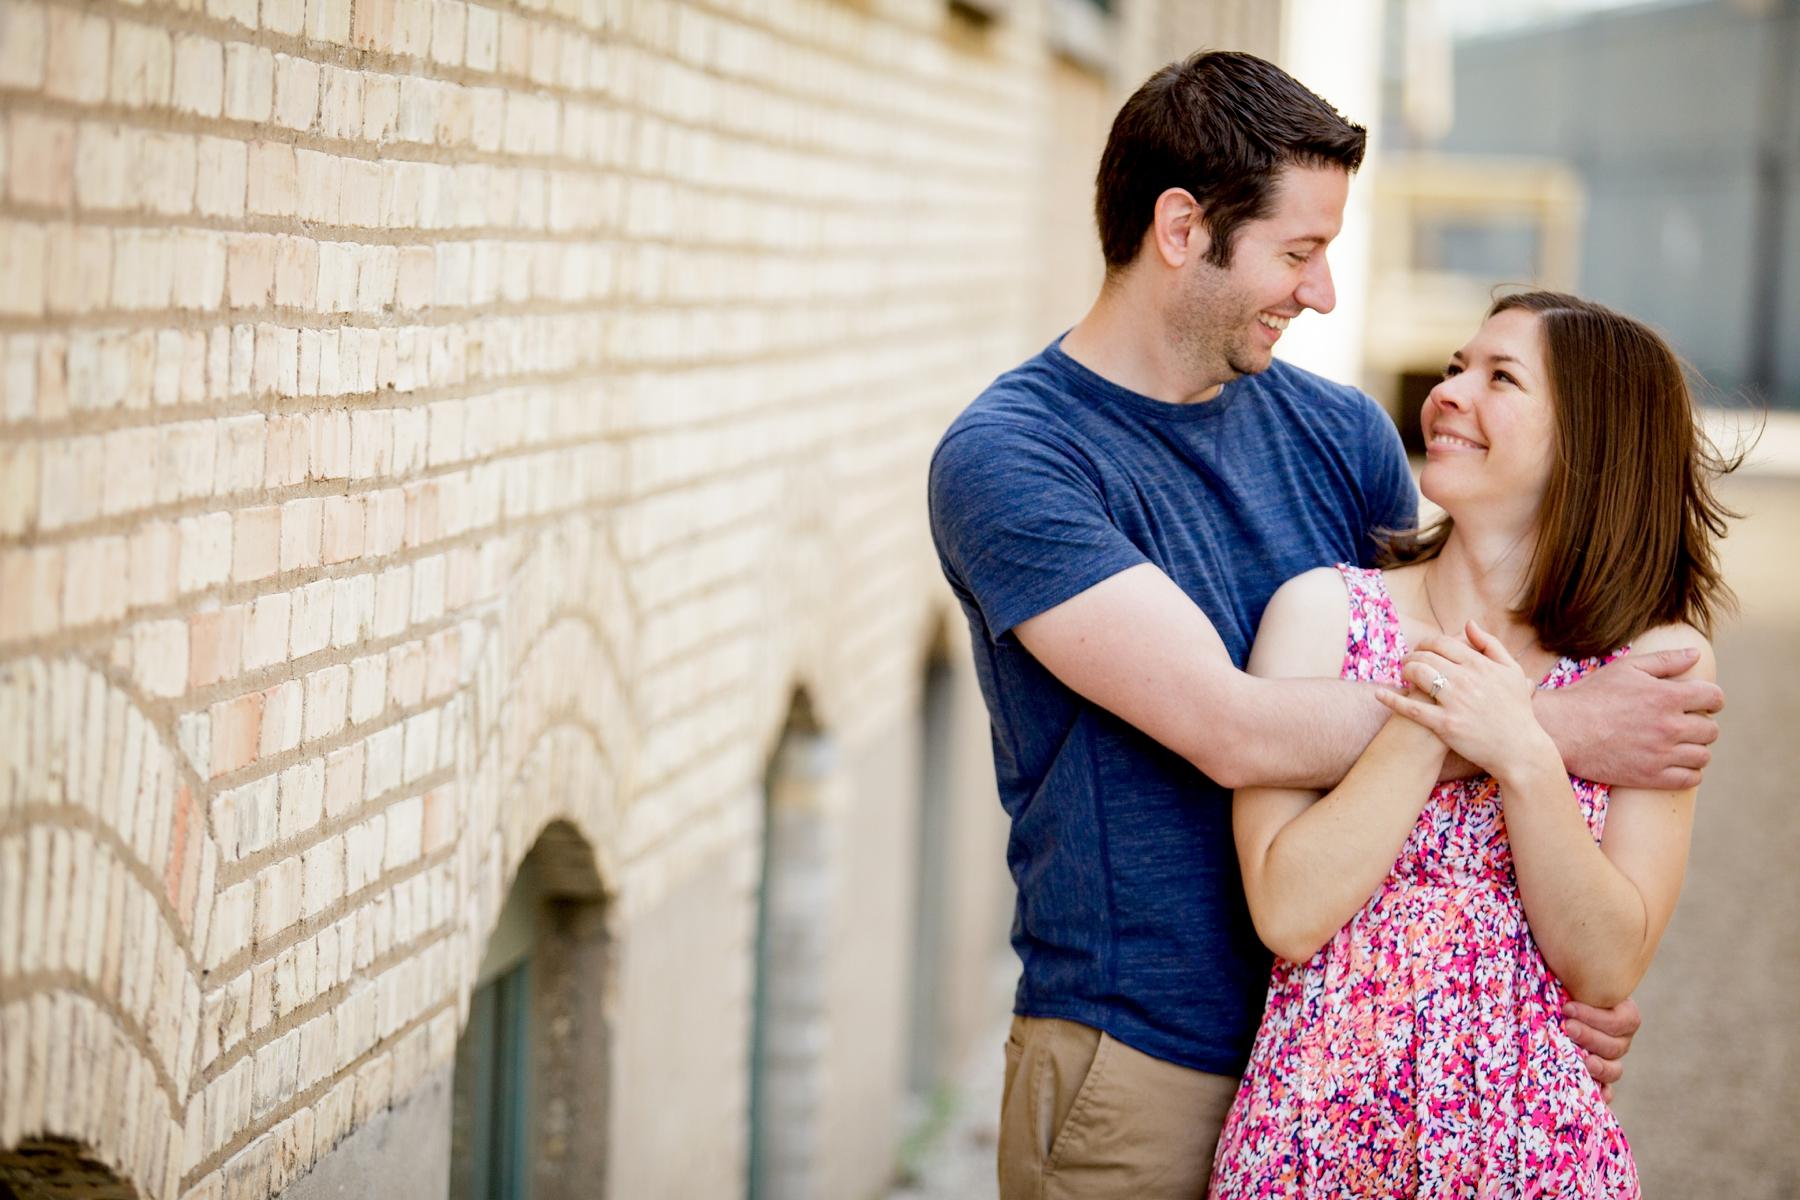 Brandon_Shafer_Photography_Michele_Chris_Michigan_Grand_Rapids_City_Engagement_0013.jpg